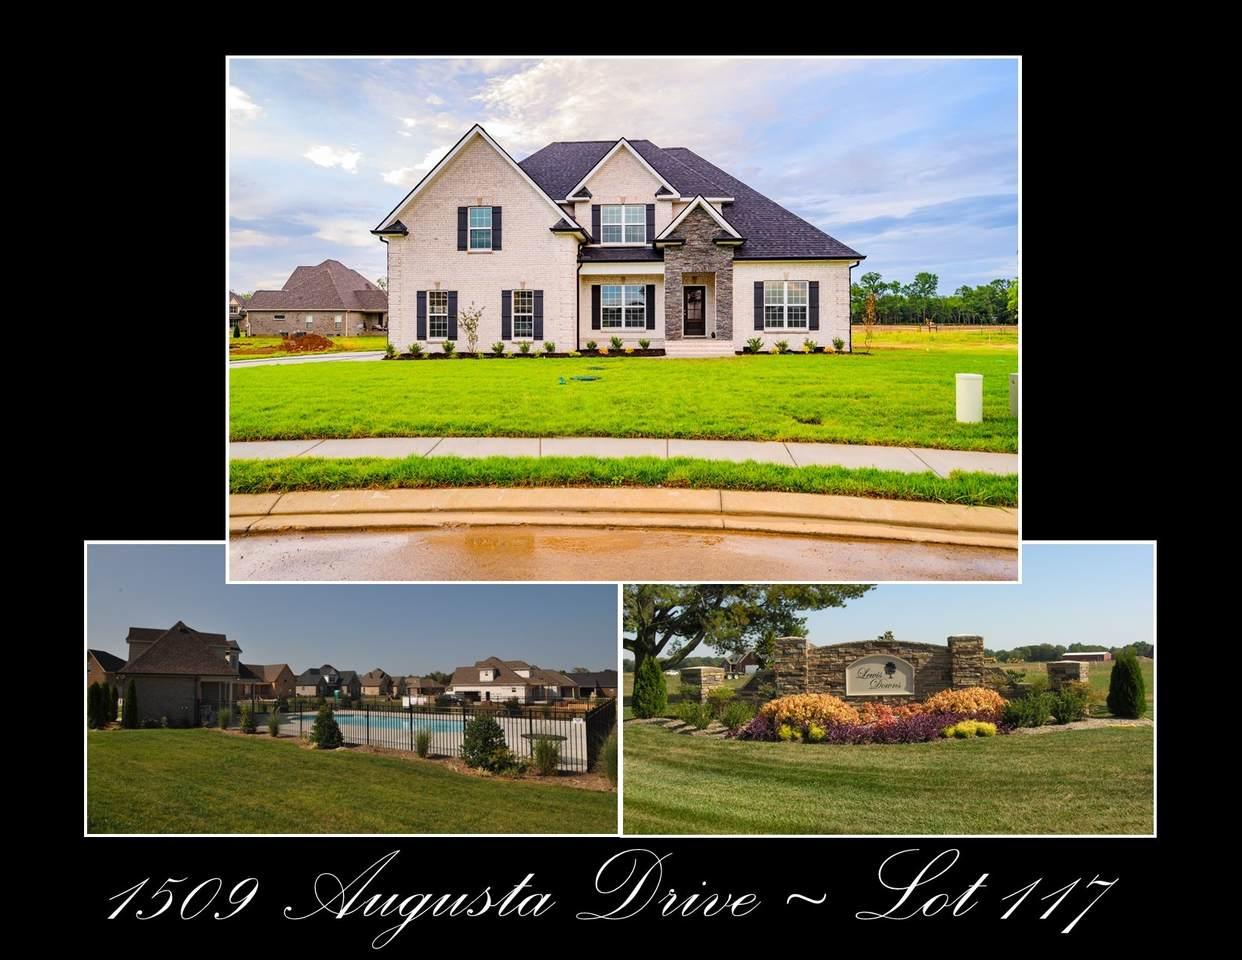 1509 Augusta Drive - Lot 117 - Photo 1